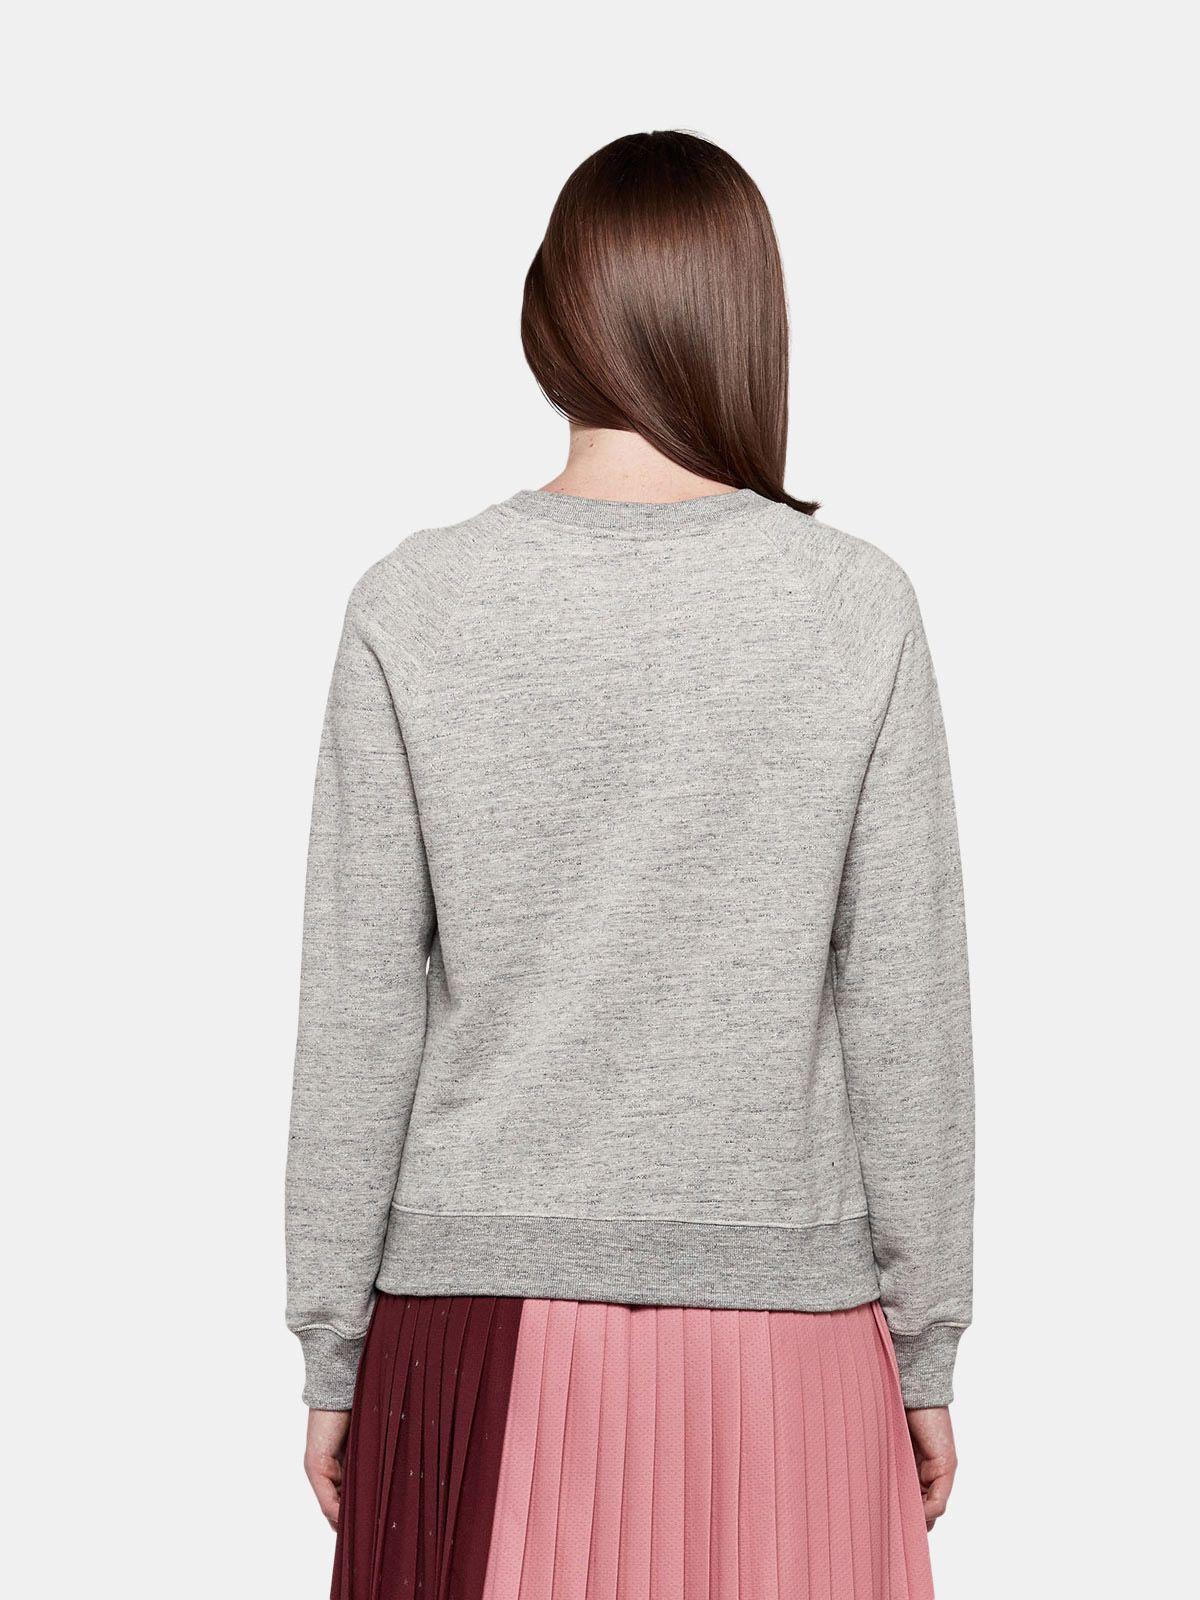 Golden Goose - Haruko sweatshirt in pure cotton with sequin embroidery in